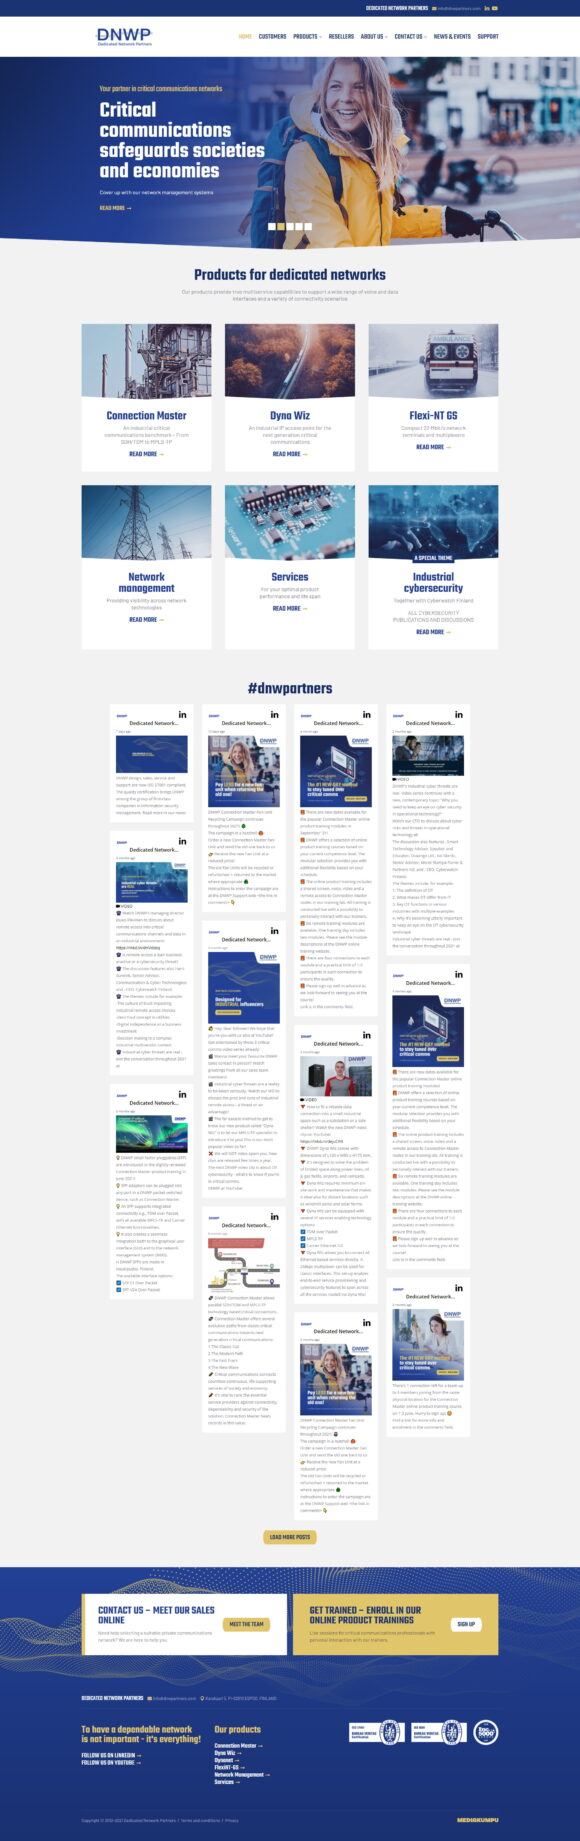 WordPress-kotisivut: Dedicated Network Partners, etusivu - Mediakumpu